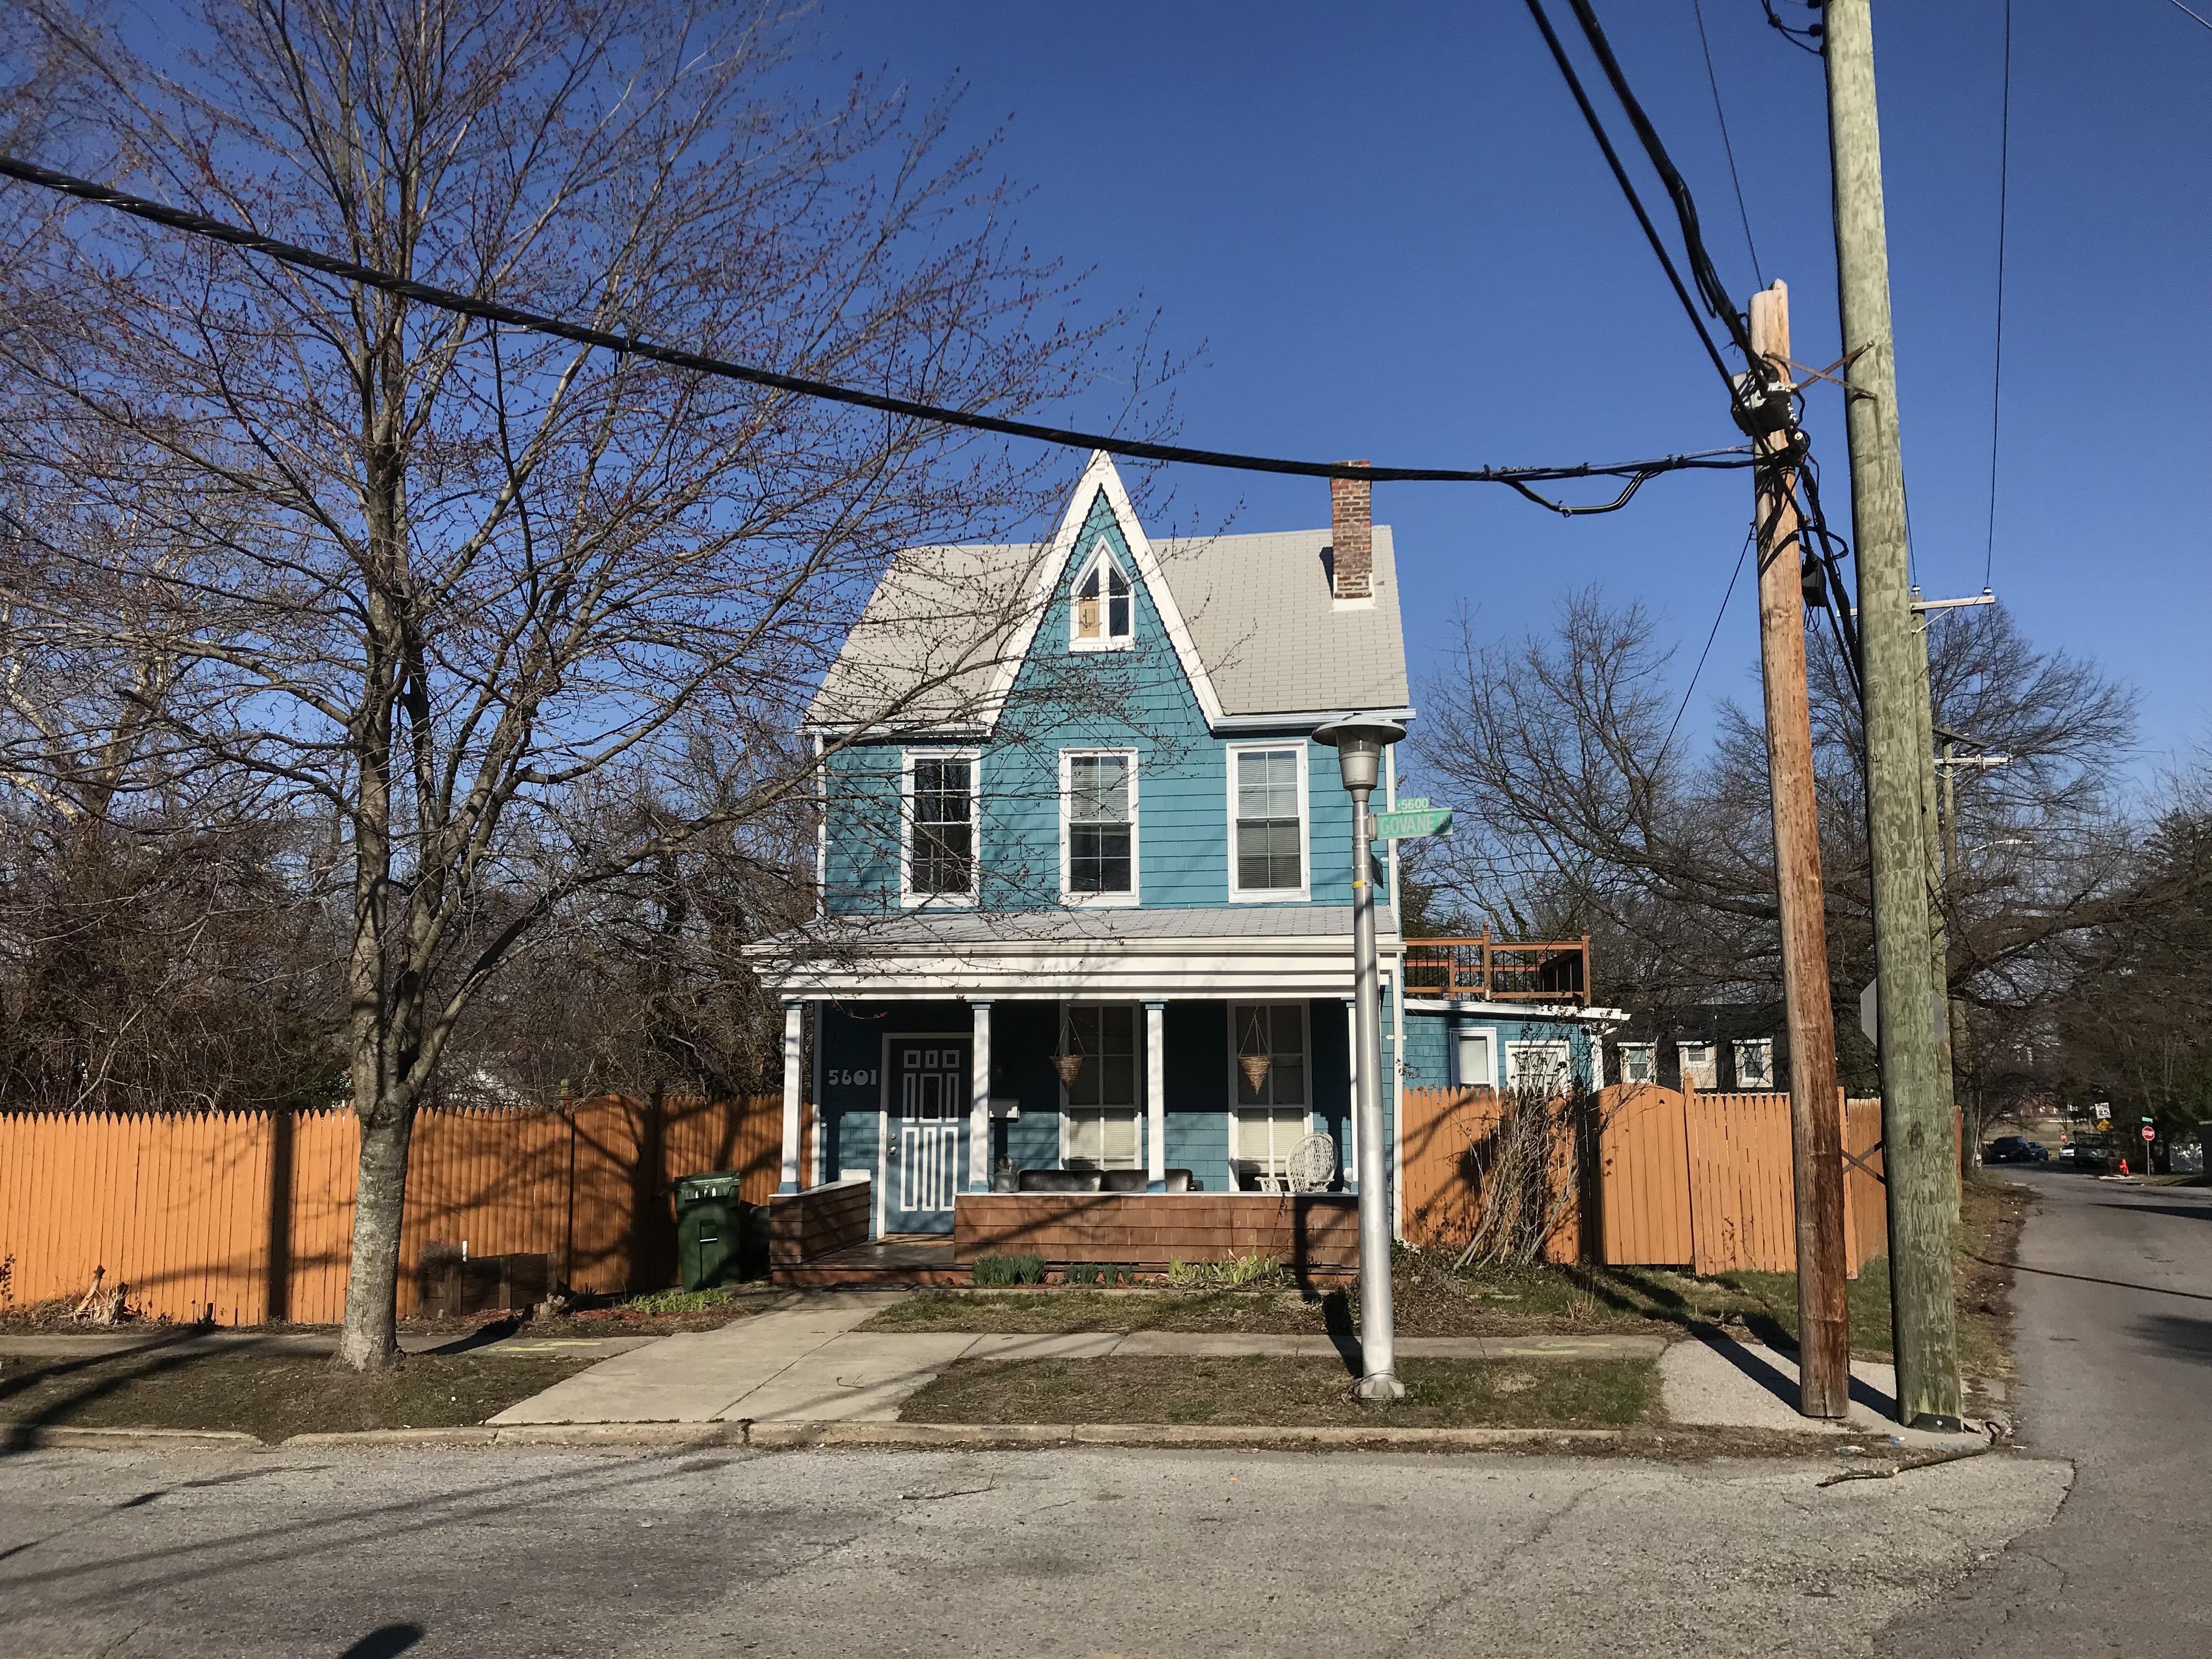 House, 5601 Govane Avenue, Baltimore, MD 21212, Sky, Tree, Road, Maryland, HQ Photo